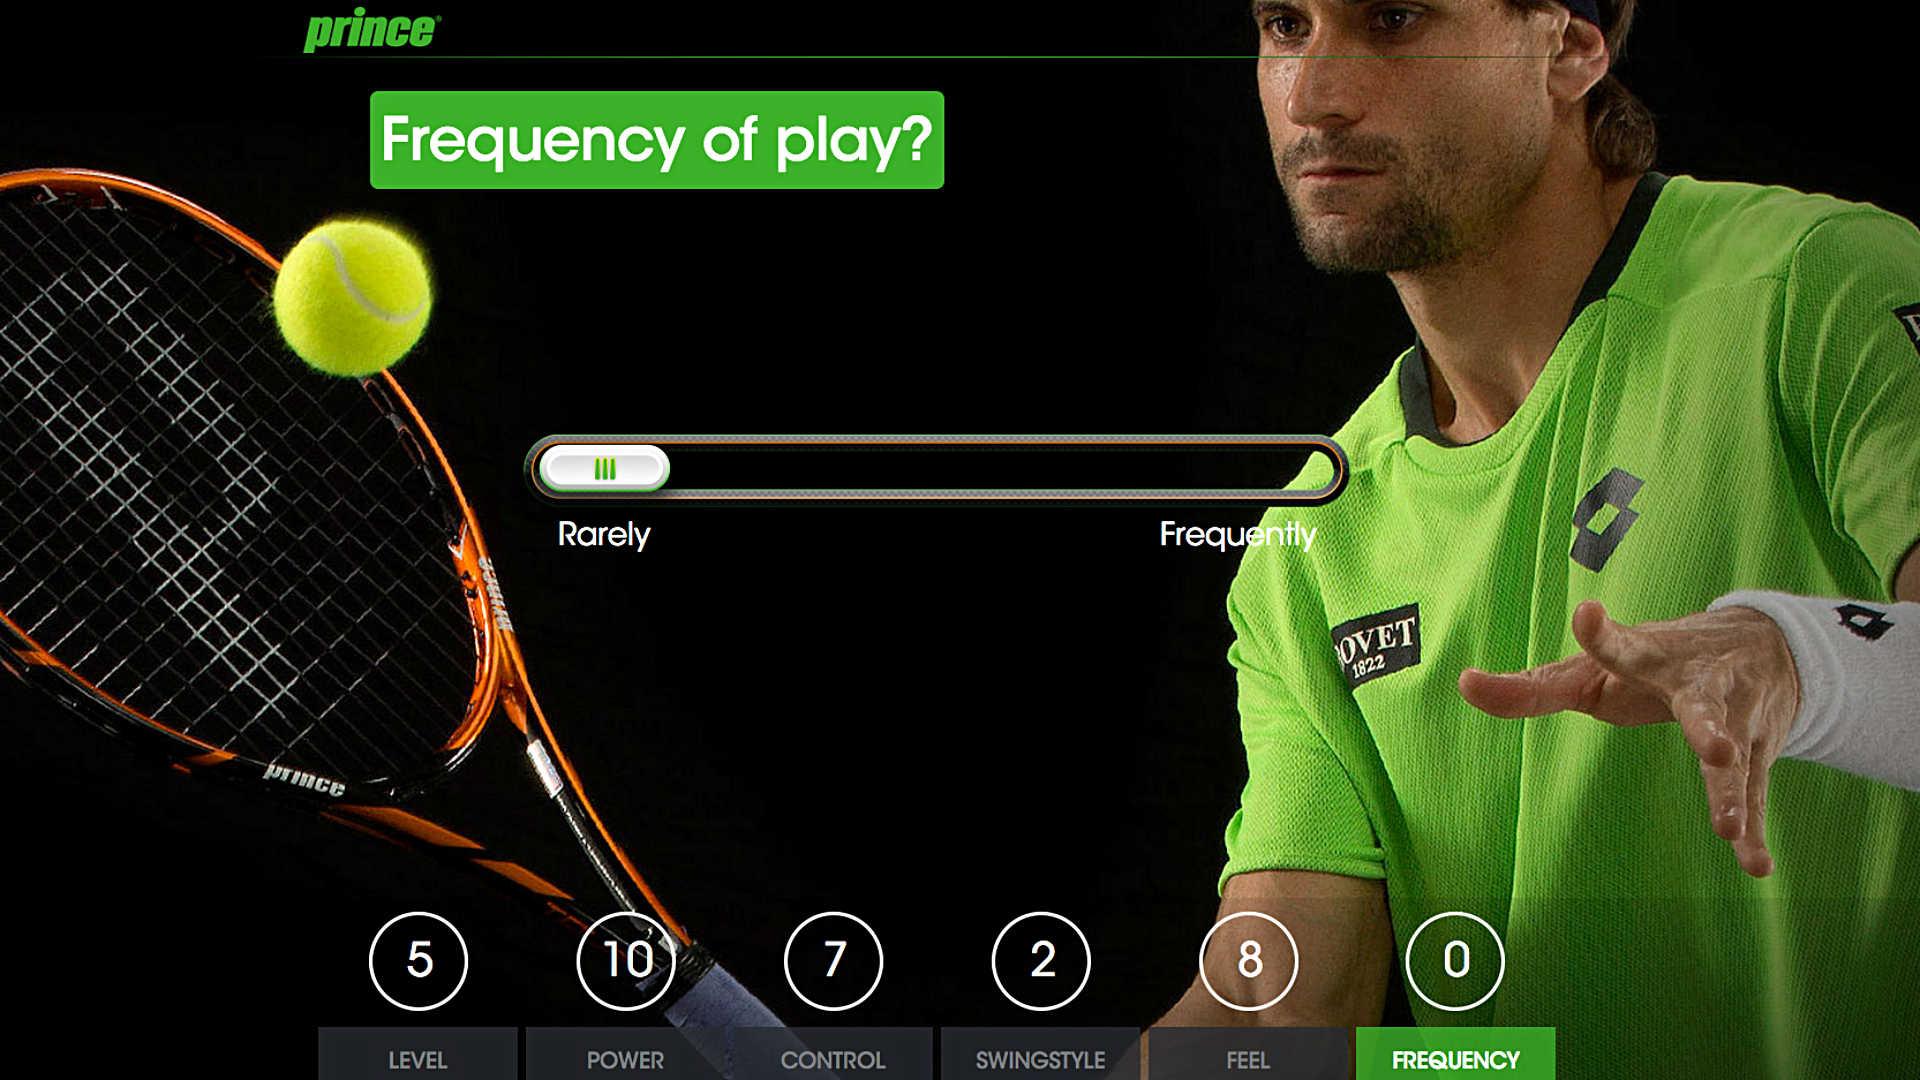 prince-tennis-030214-ap-ftr.jpg